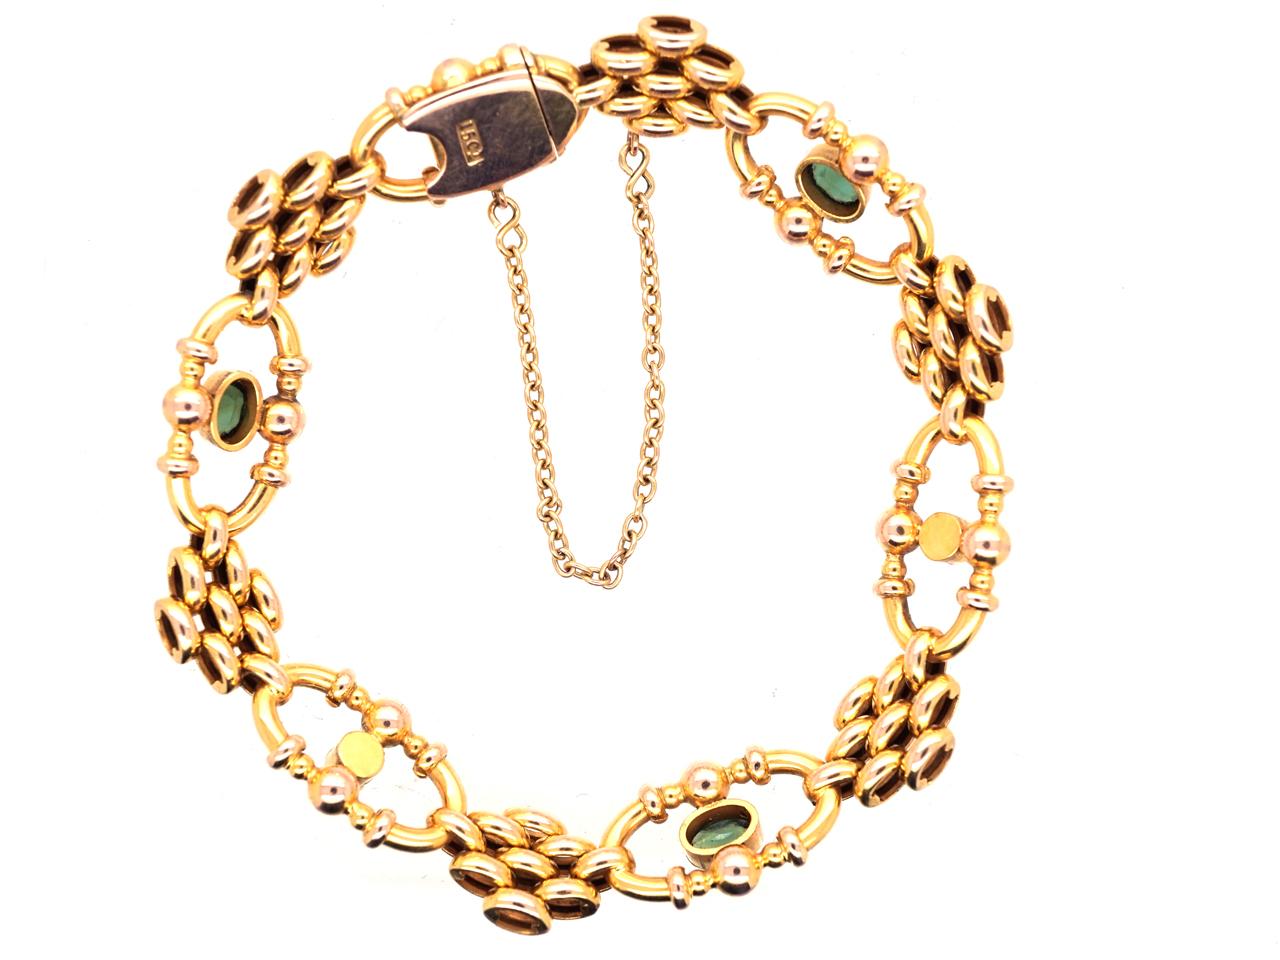 Edwardian 15ct Gold,Tourmaline & Natural Split Pearls Bracelet